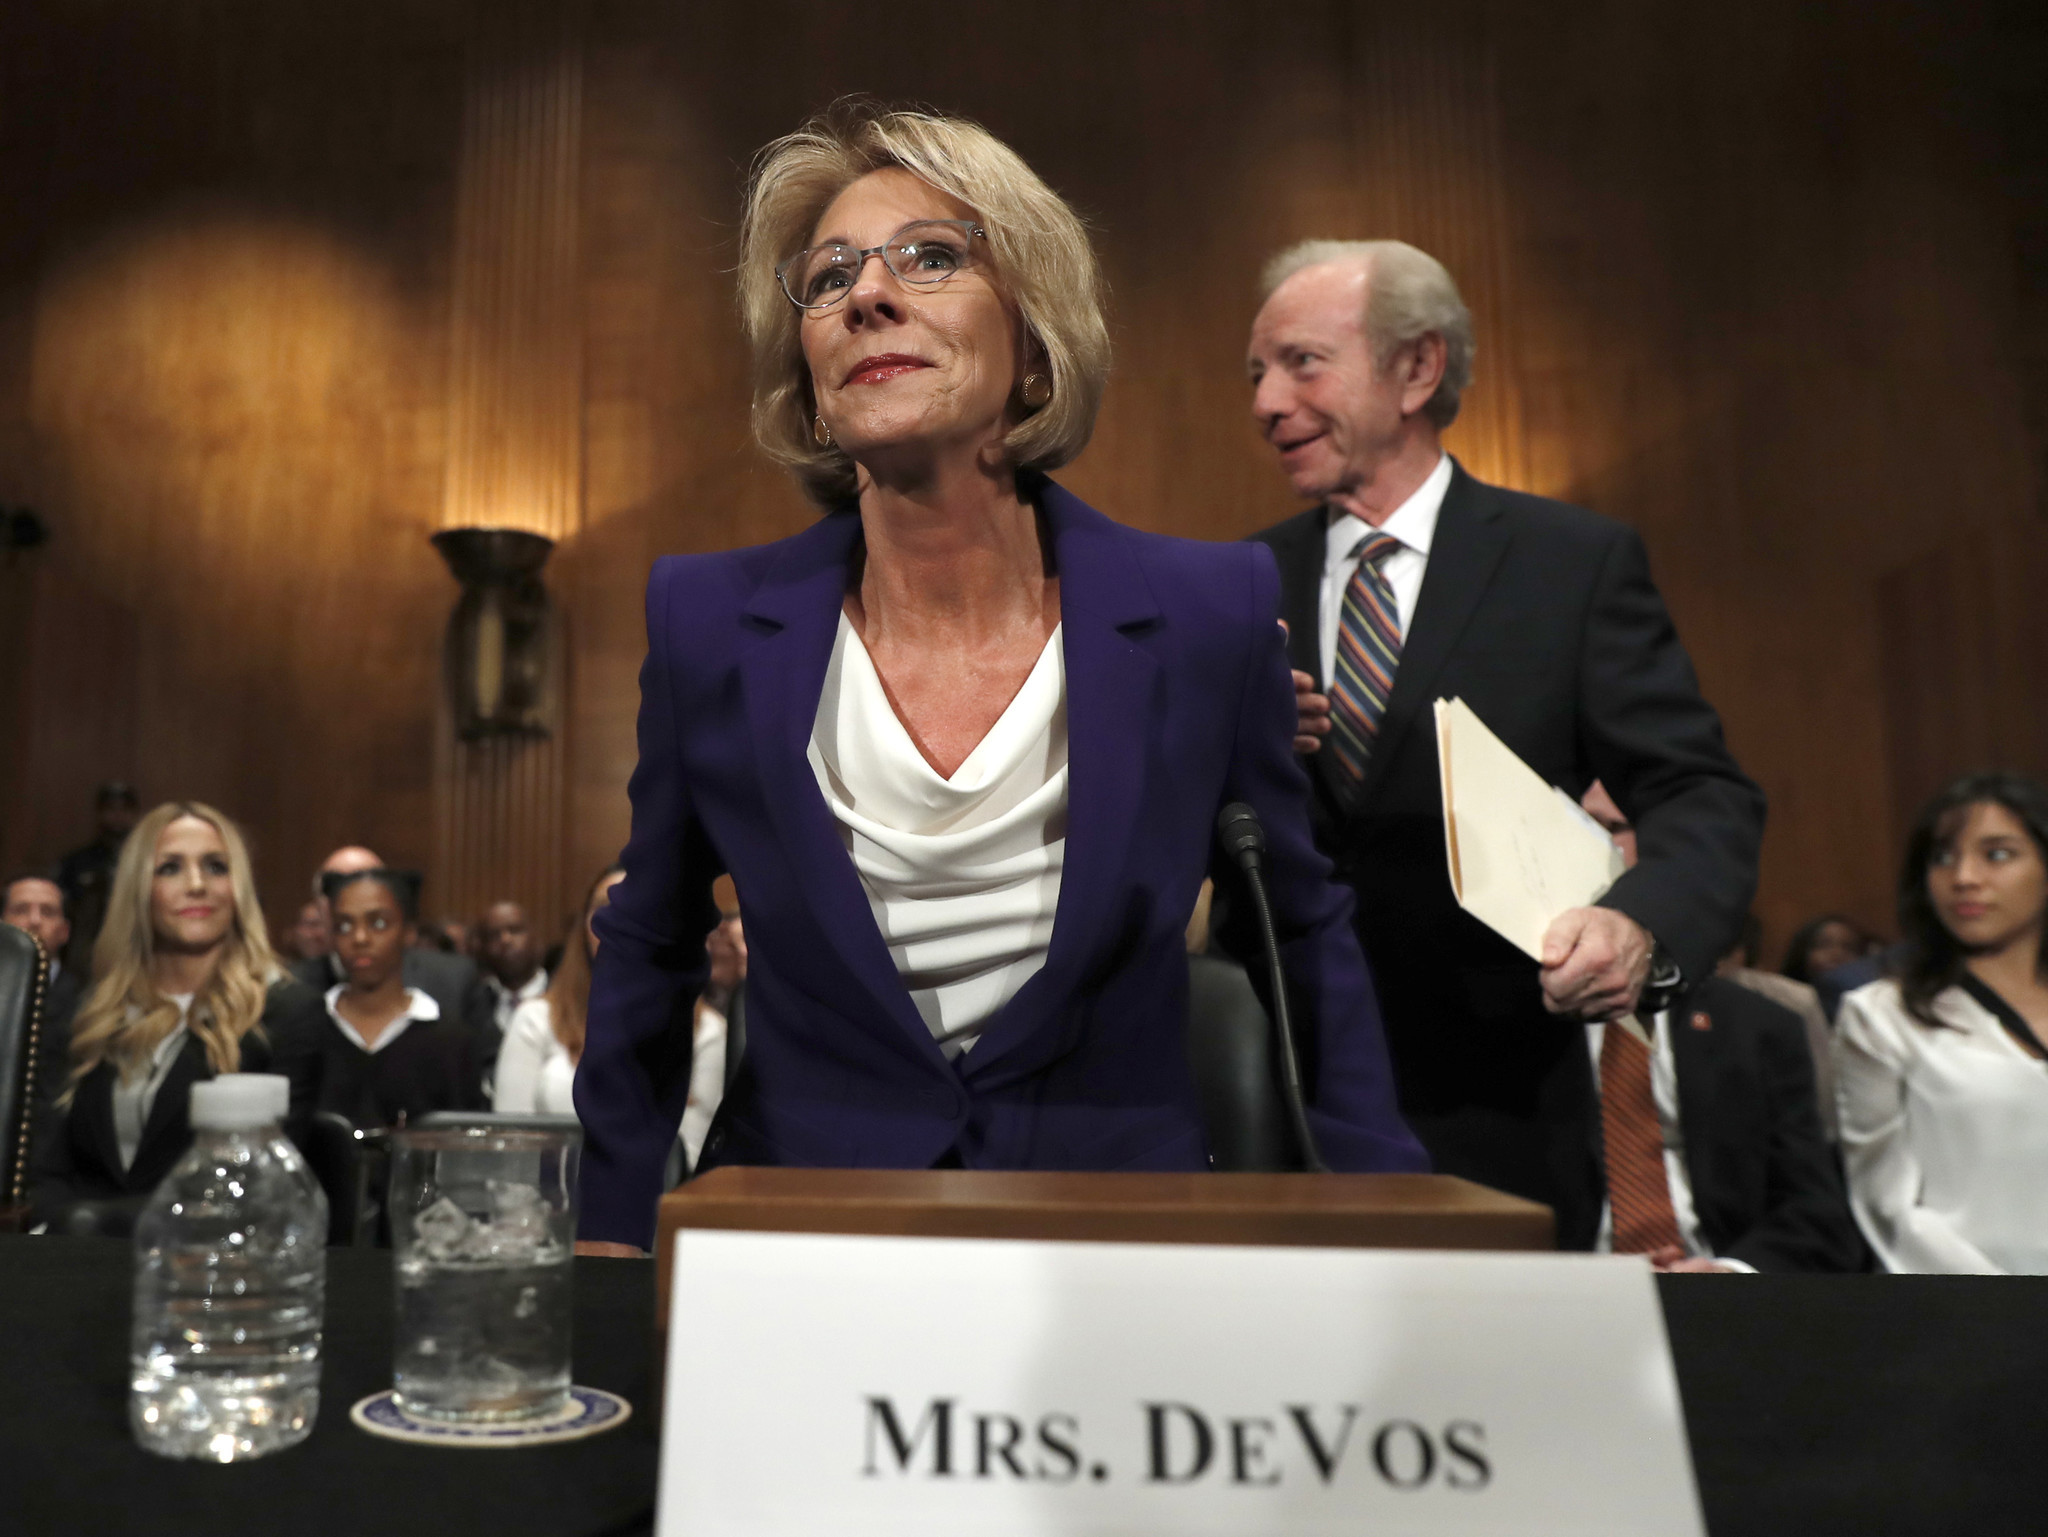 Education secretary pick betsy devos called bold reformer unfit for